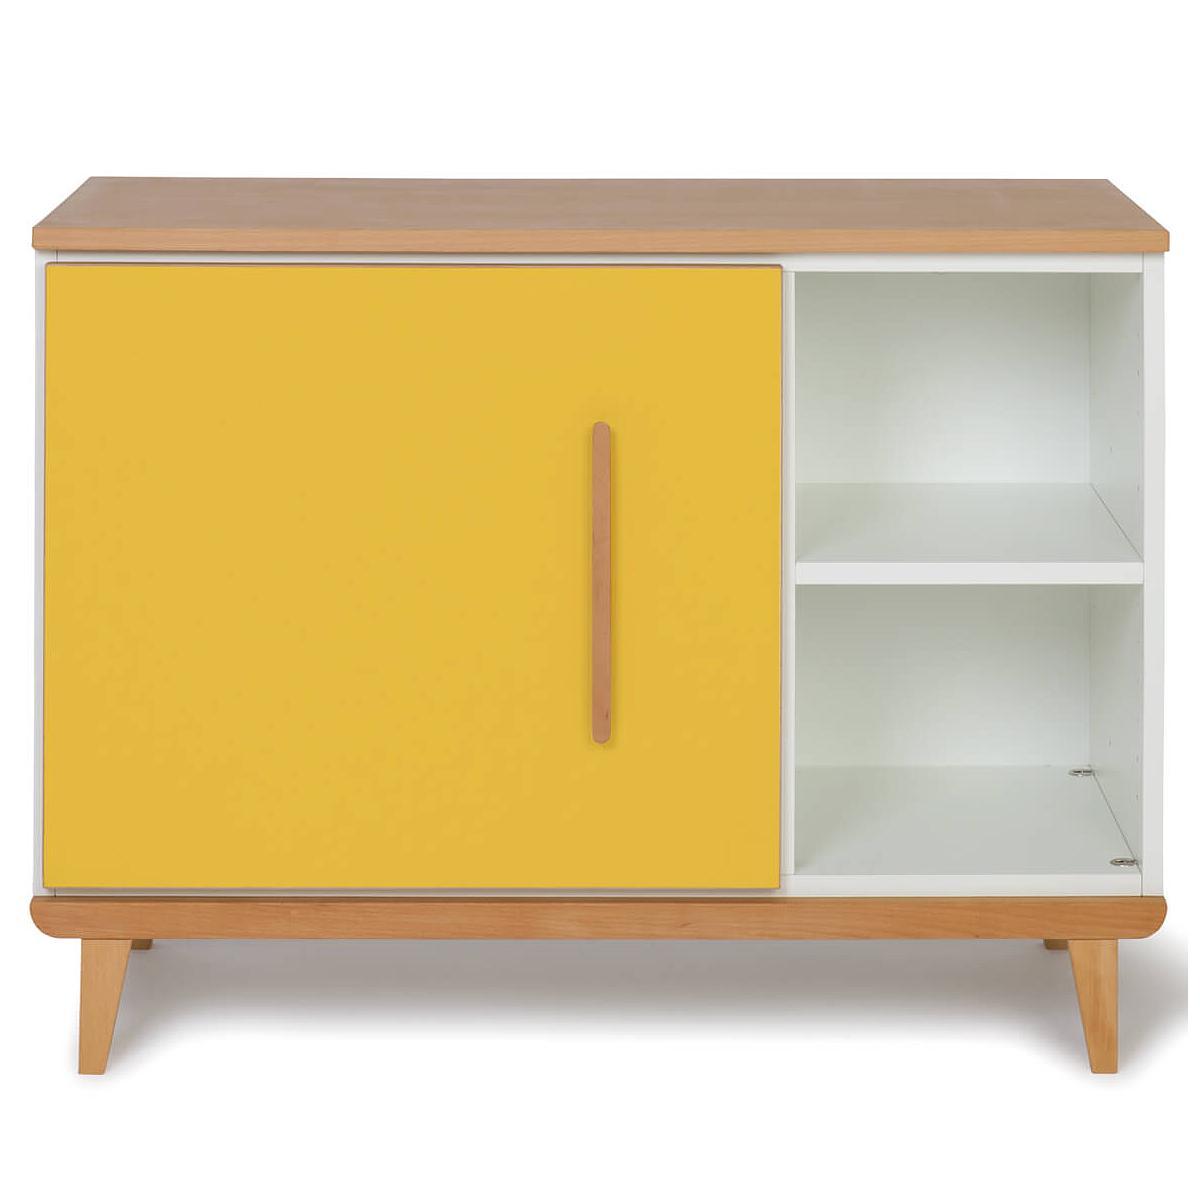 Wookids - Petit meuble 1 porte NADO yellow